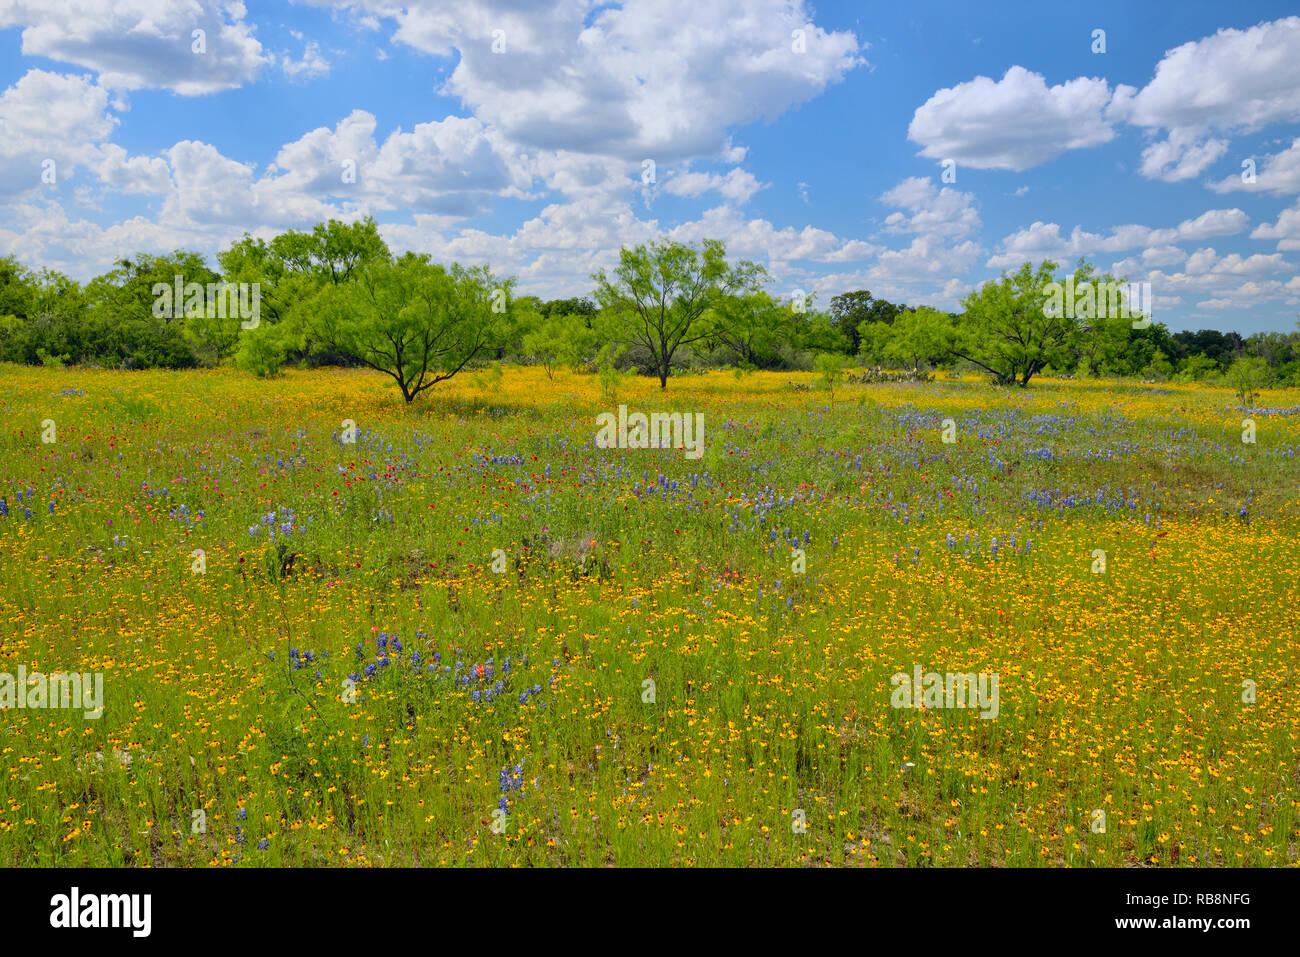 Wildflowers along Ranch Road 152, Llano County, Texas, USA - Stock Image